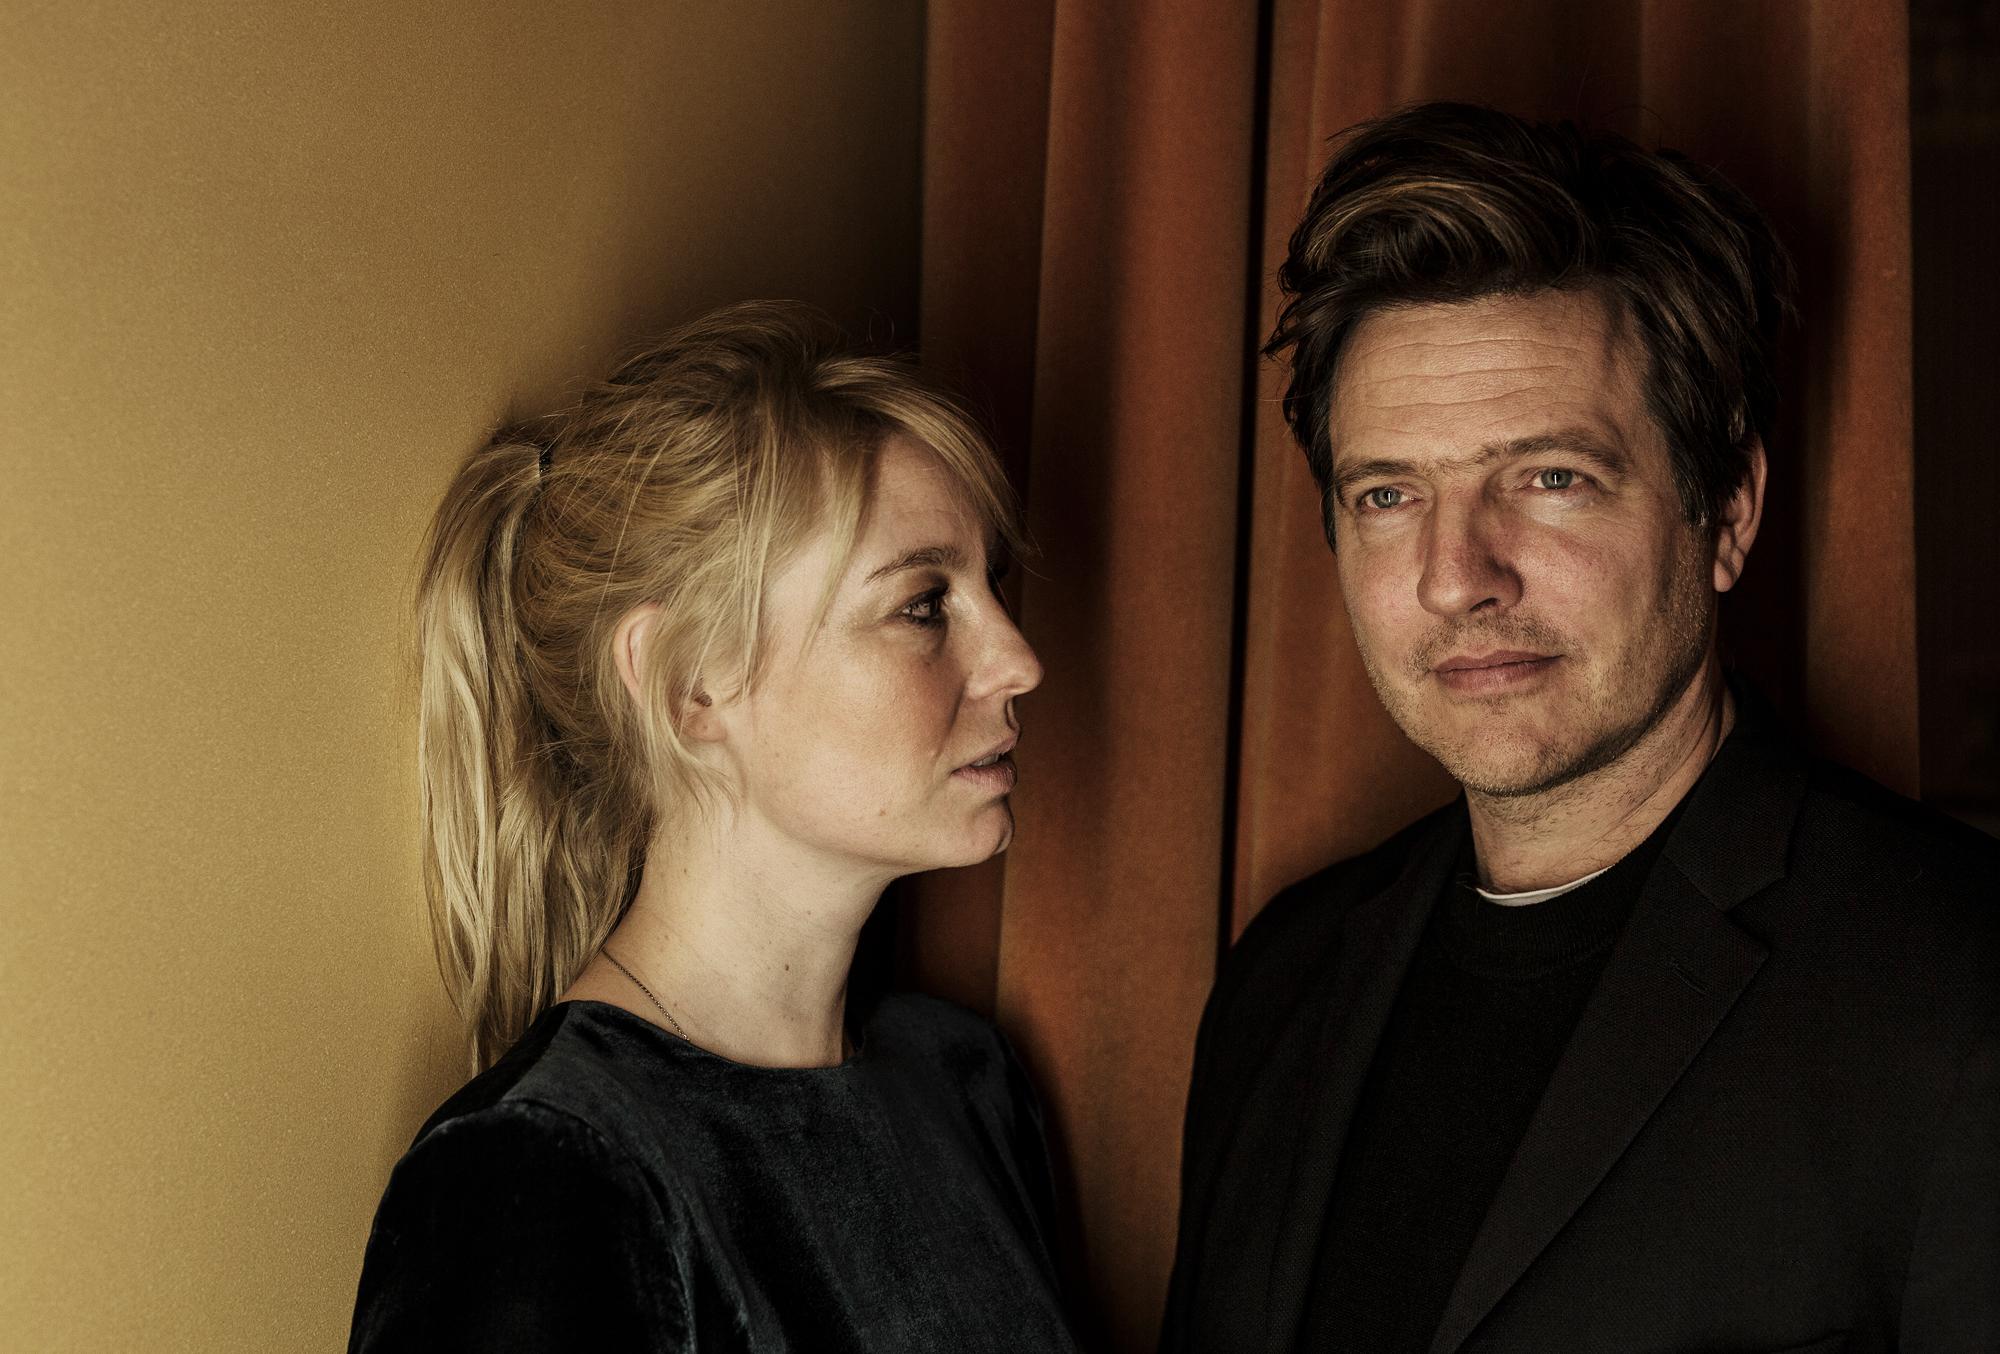 Helene Reingaard Neumann & Tomas Vinterberg